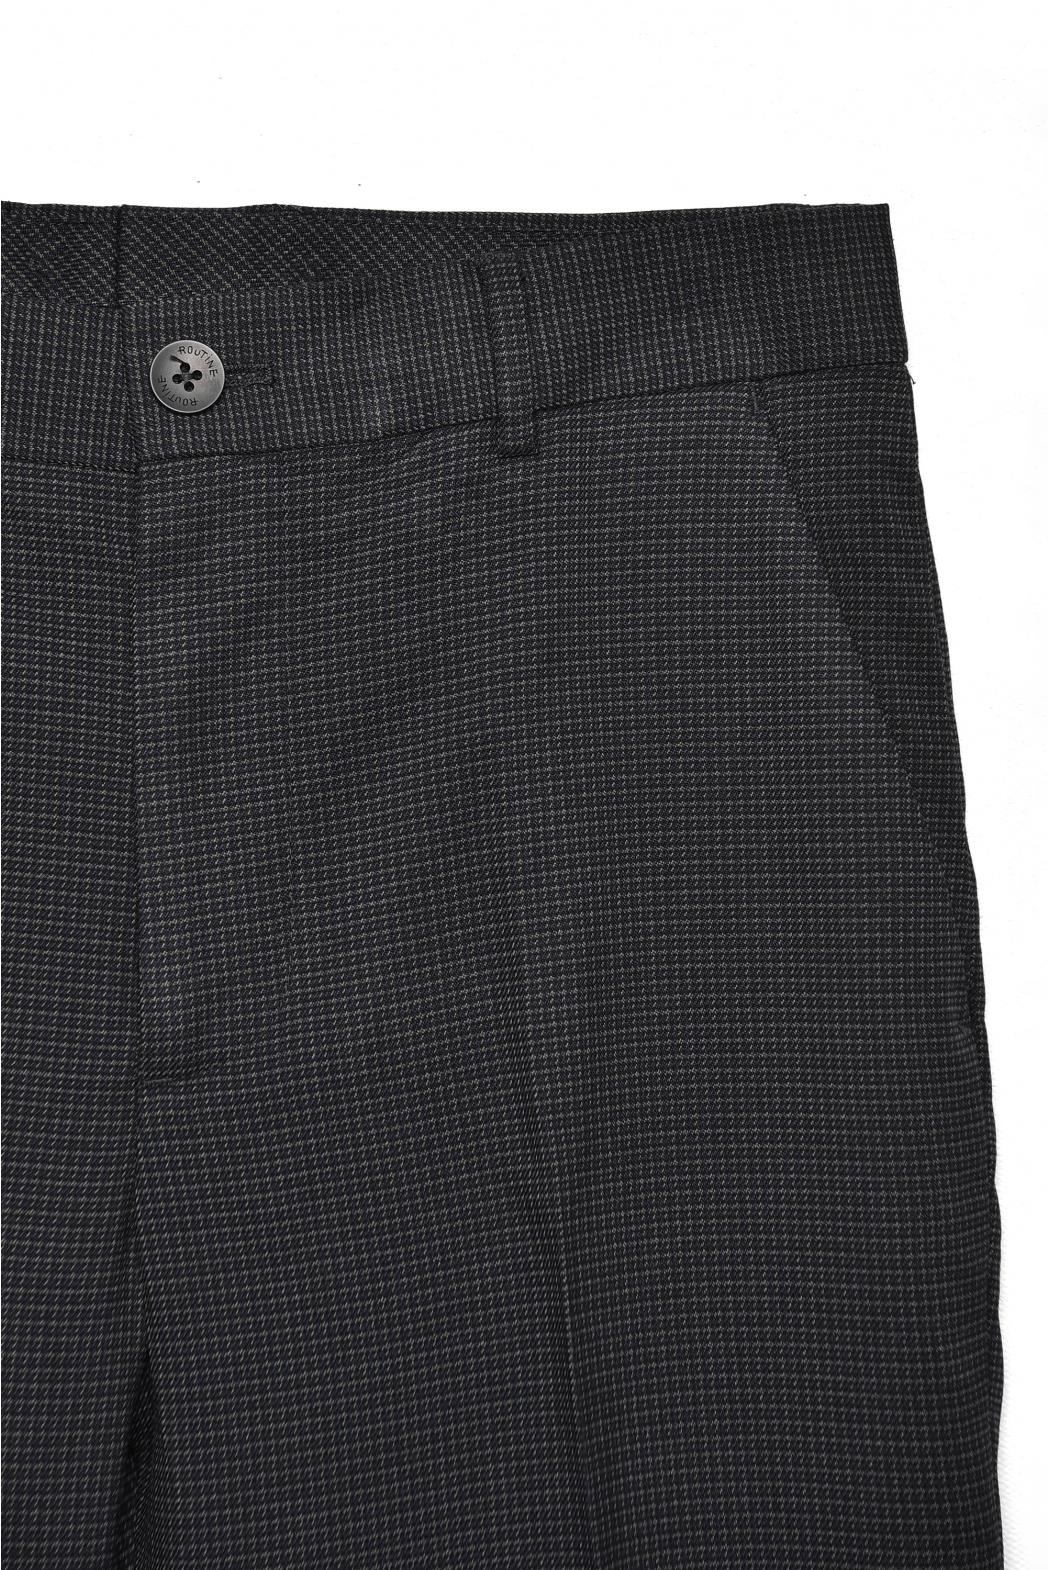 Quần vải. Stripe. SLIMCROP form - 10F20PFO011